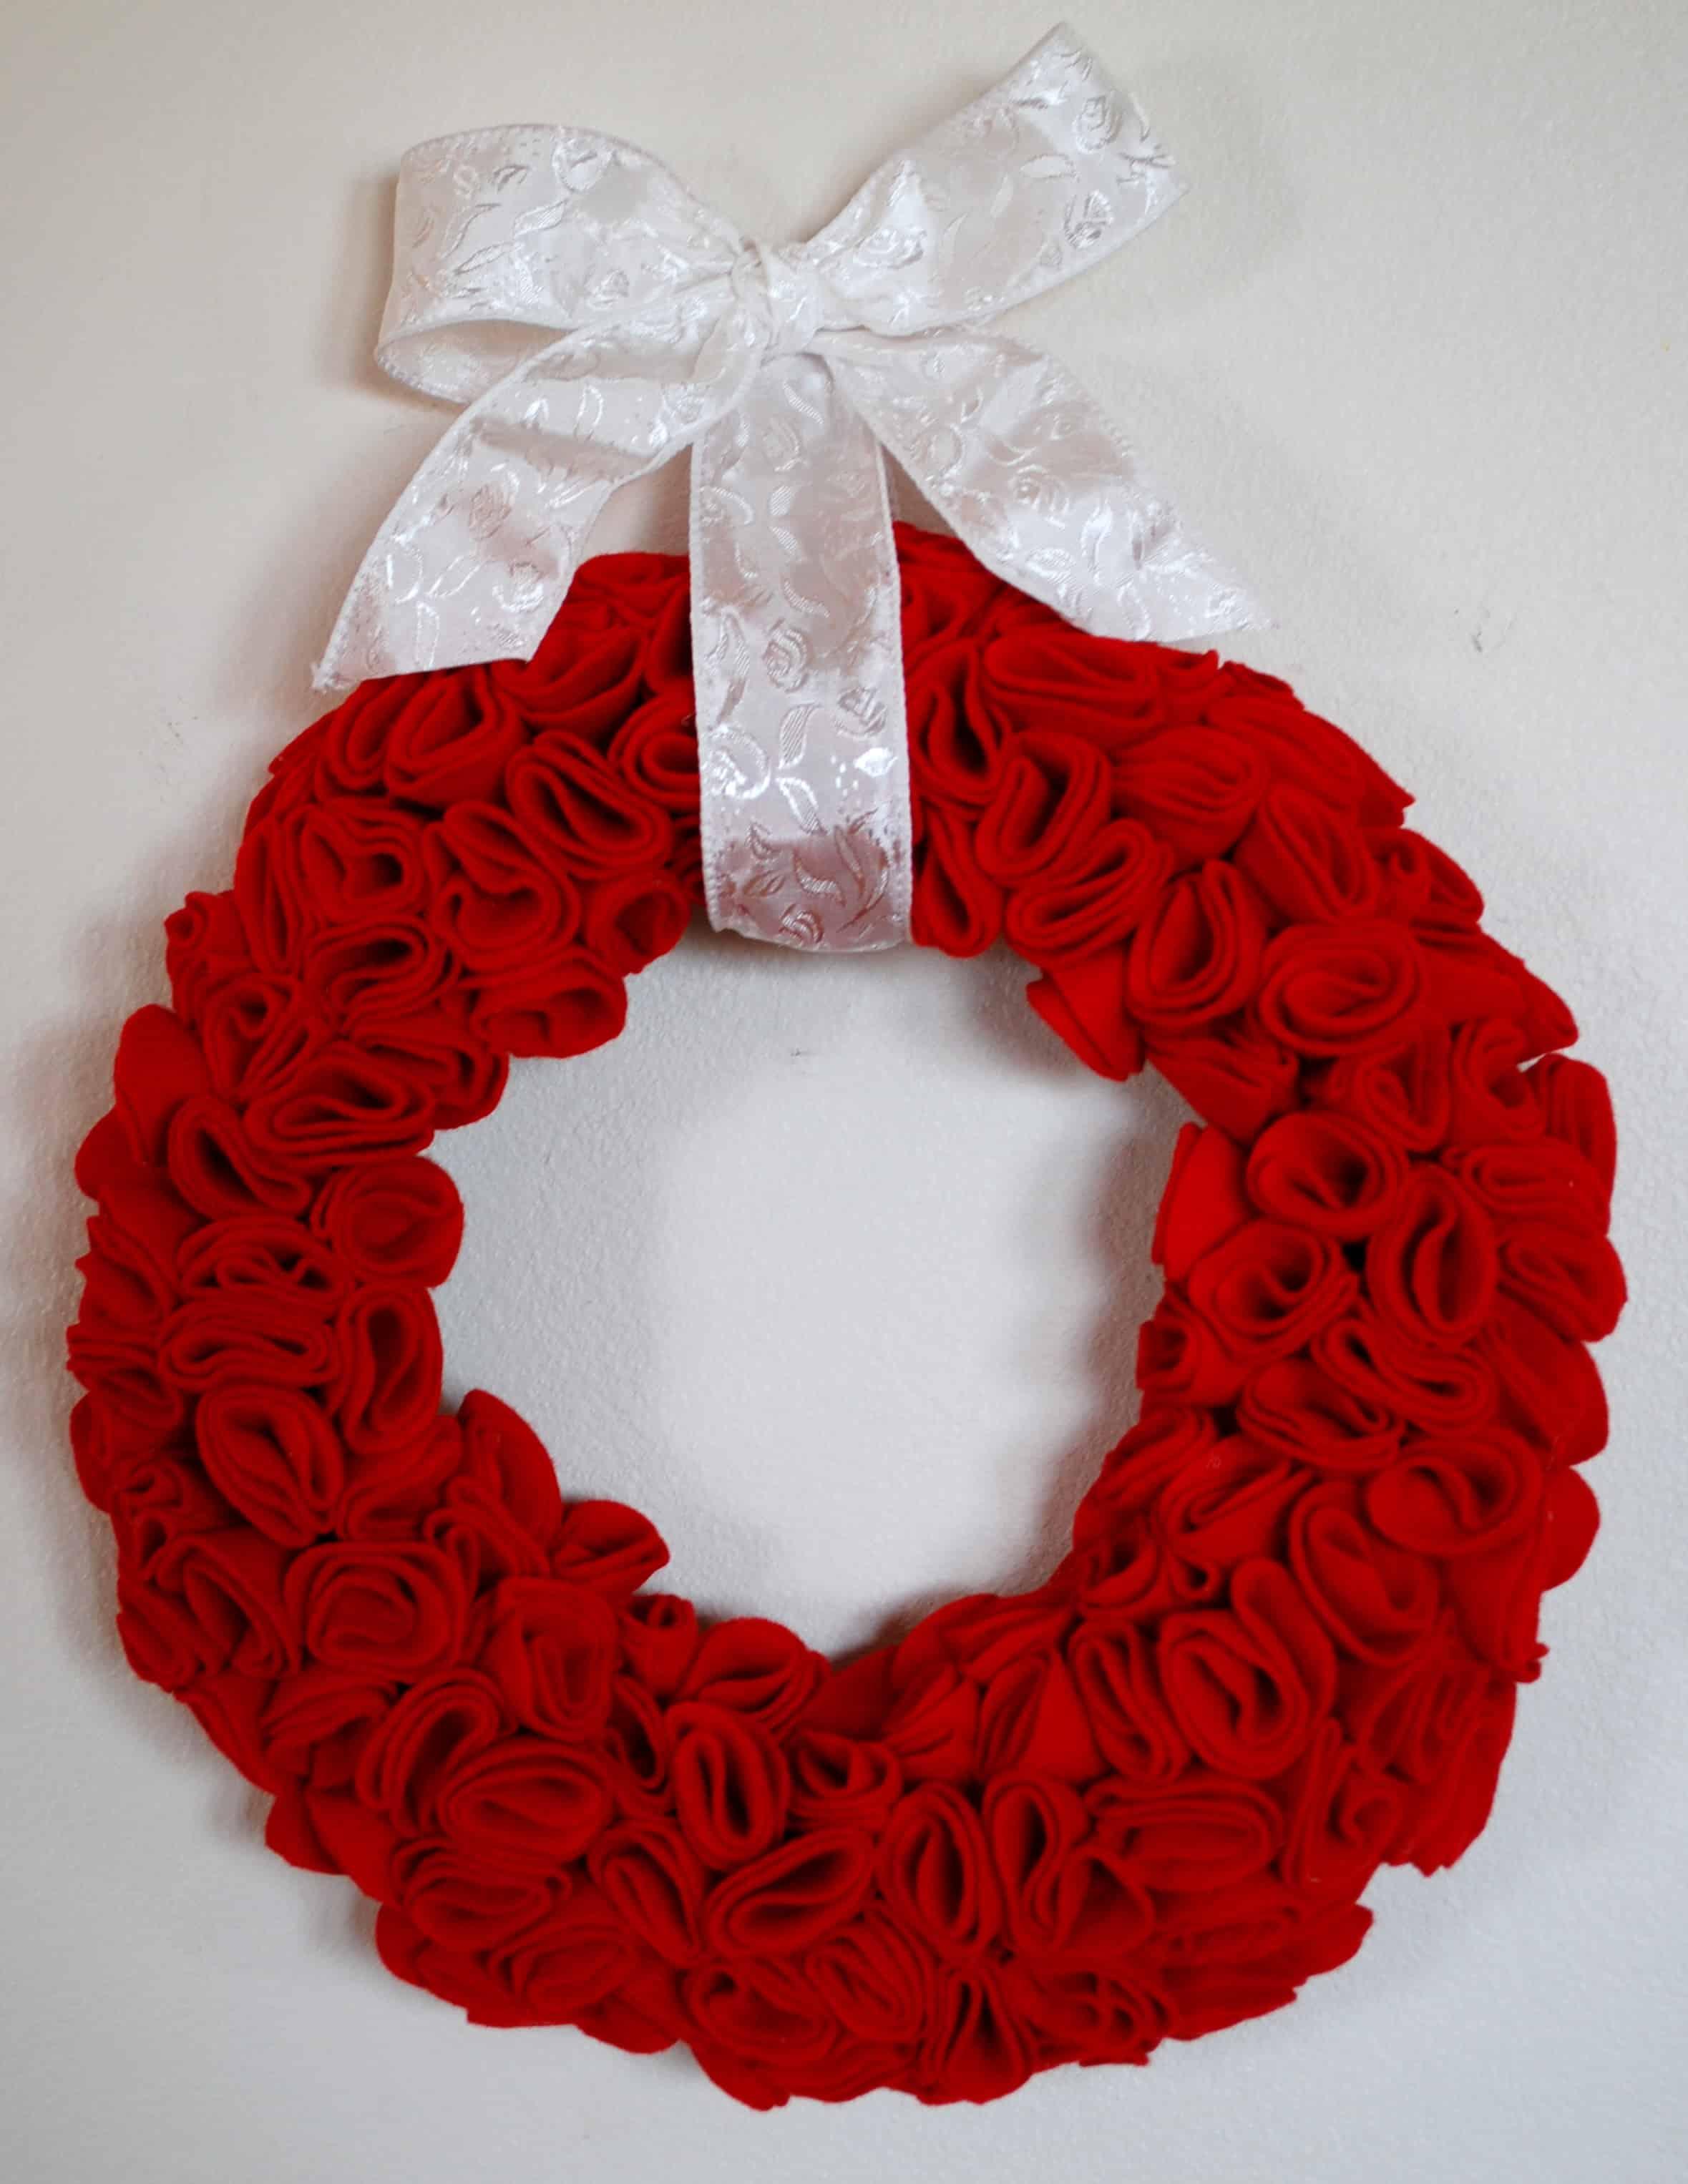 Rose Wreath Decor